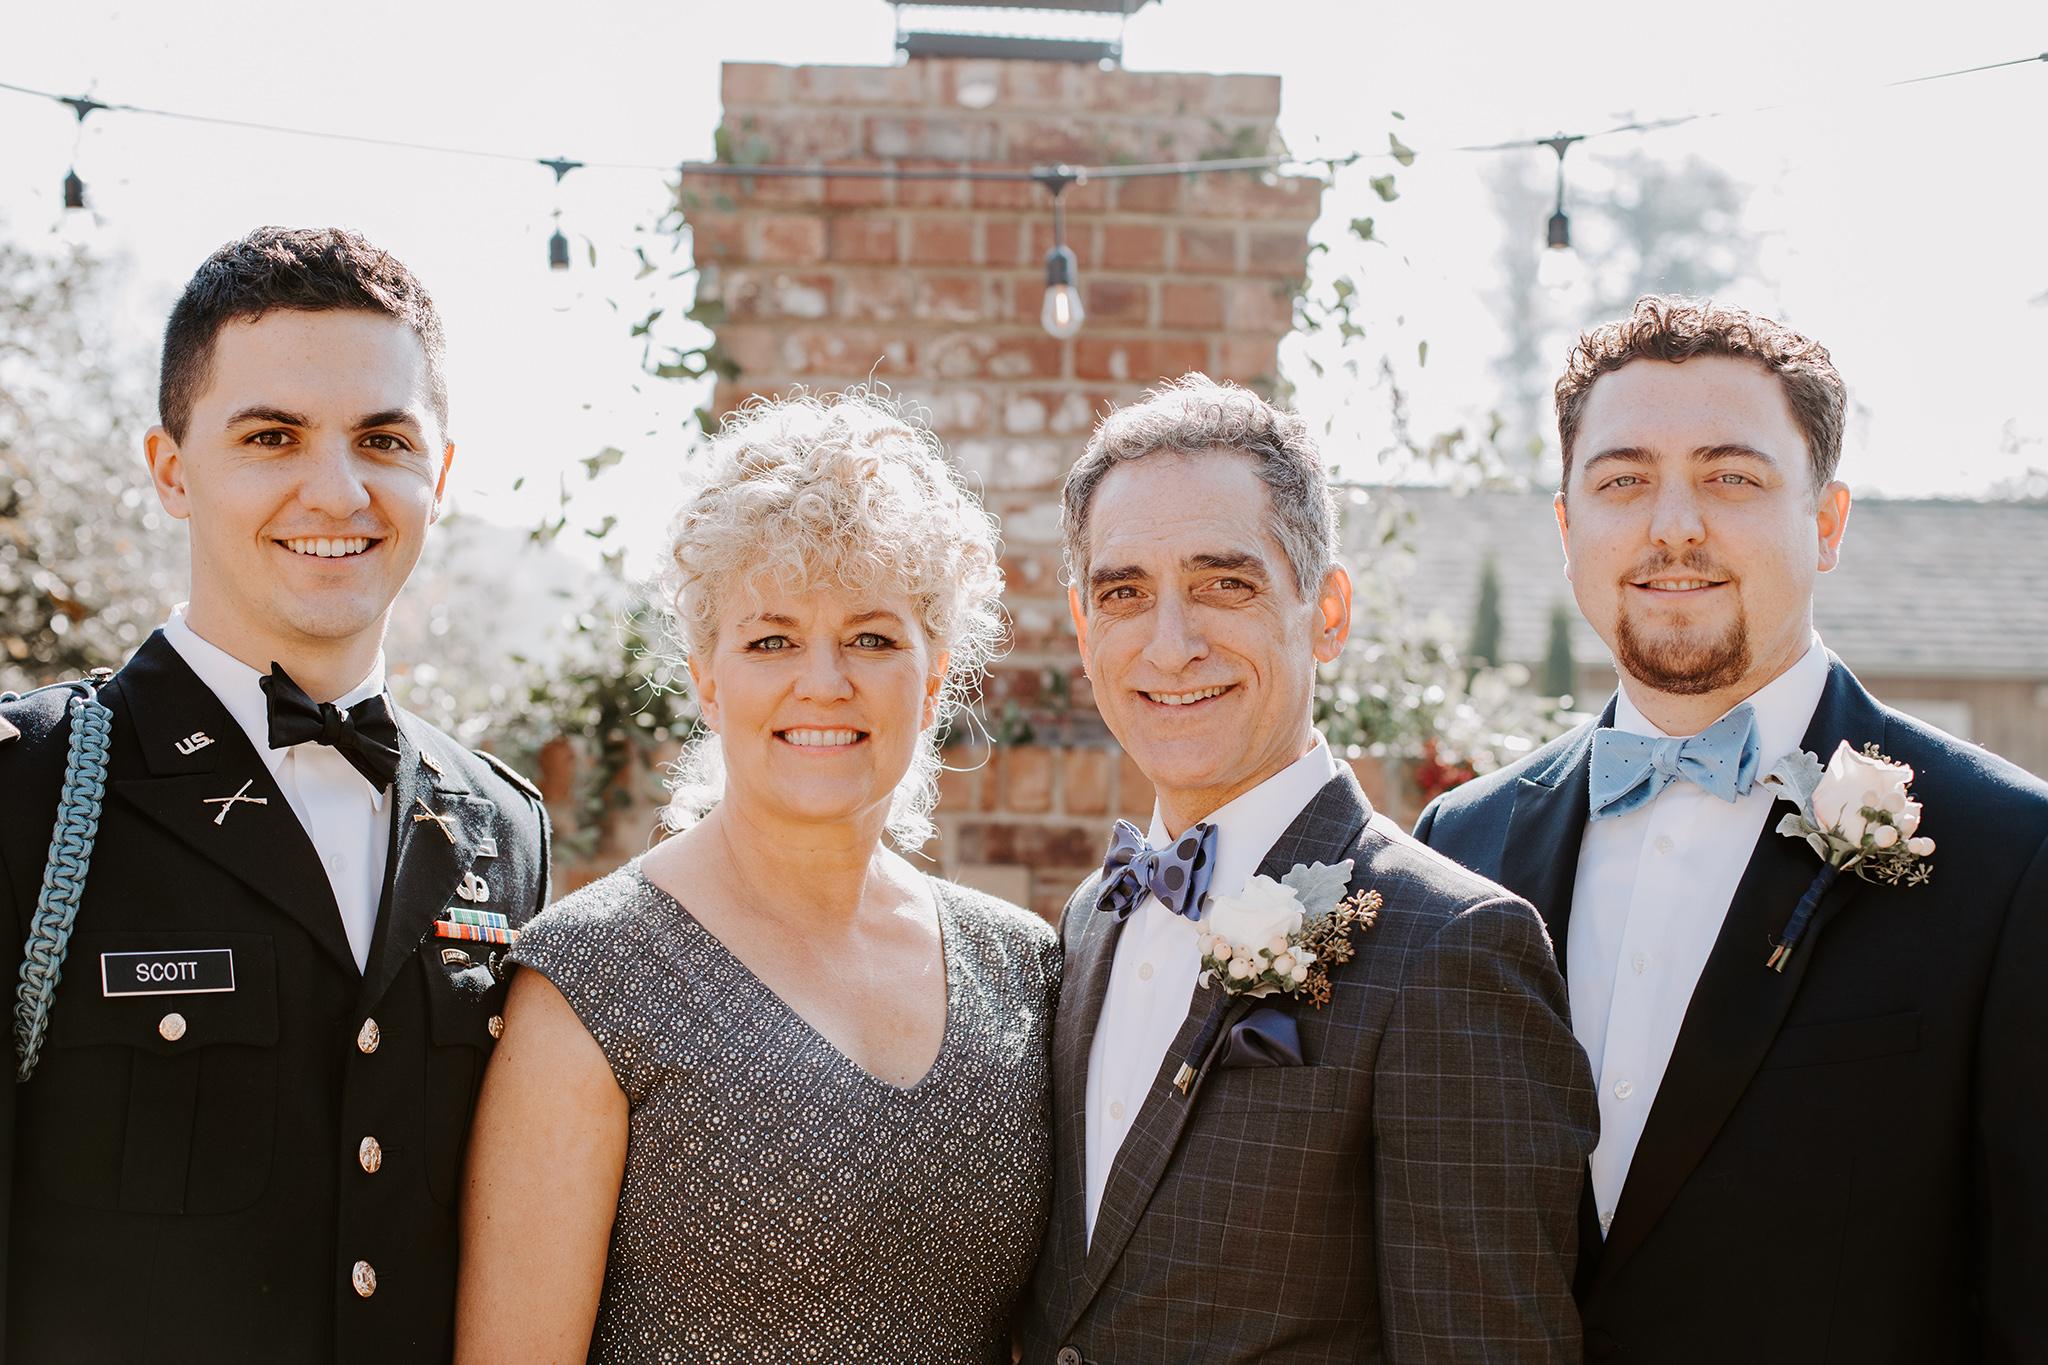 Brittany Martorella Photography - Olympia Waashington Wedding Photographer - Andrew Scott + Kristina Kozakova Wedding 10/21/2018